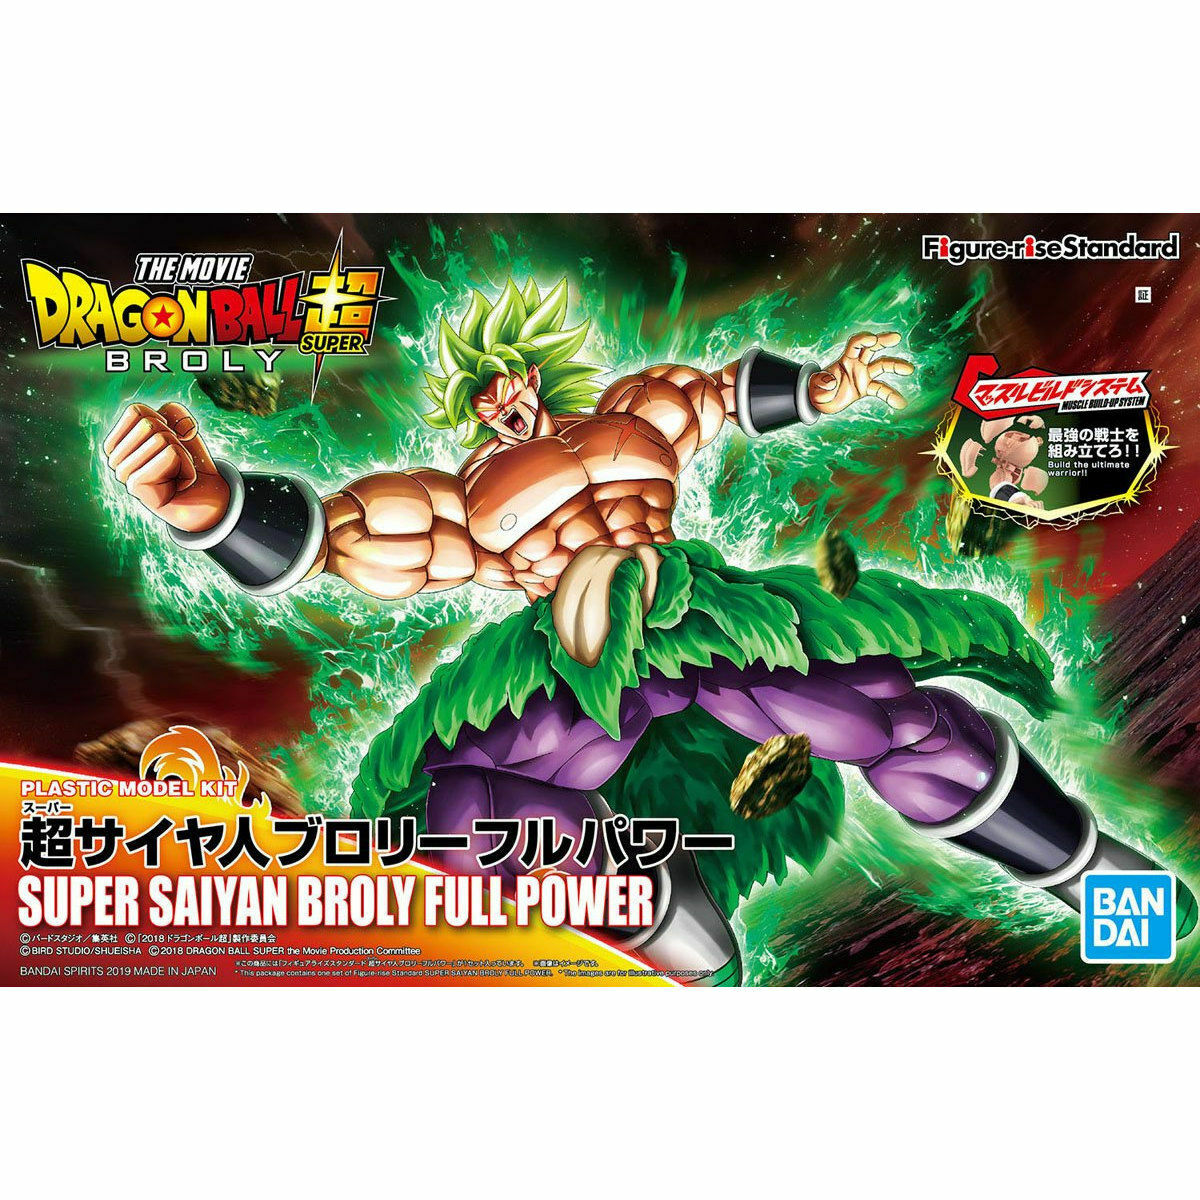 Figure-Rise Standard Dragon Ball Super Saiyan Blory Full Power Kit Modello